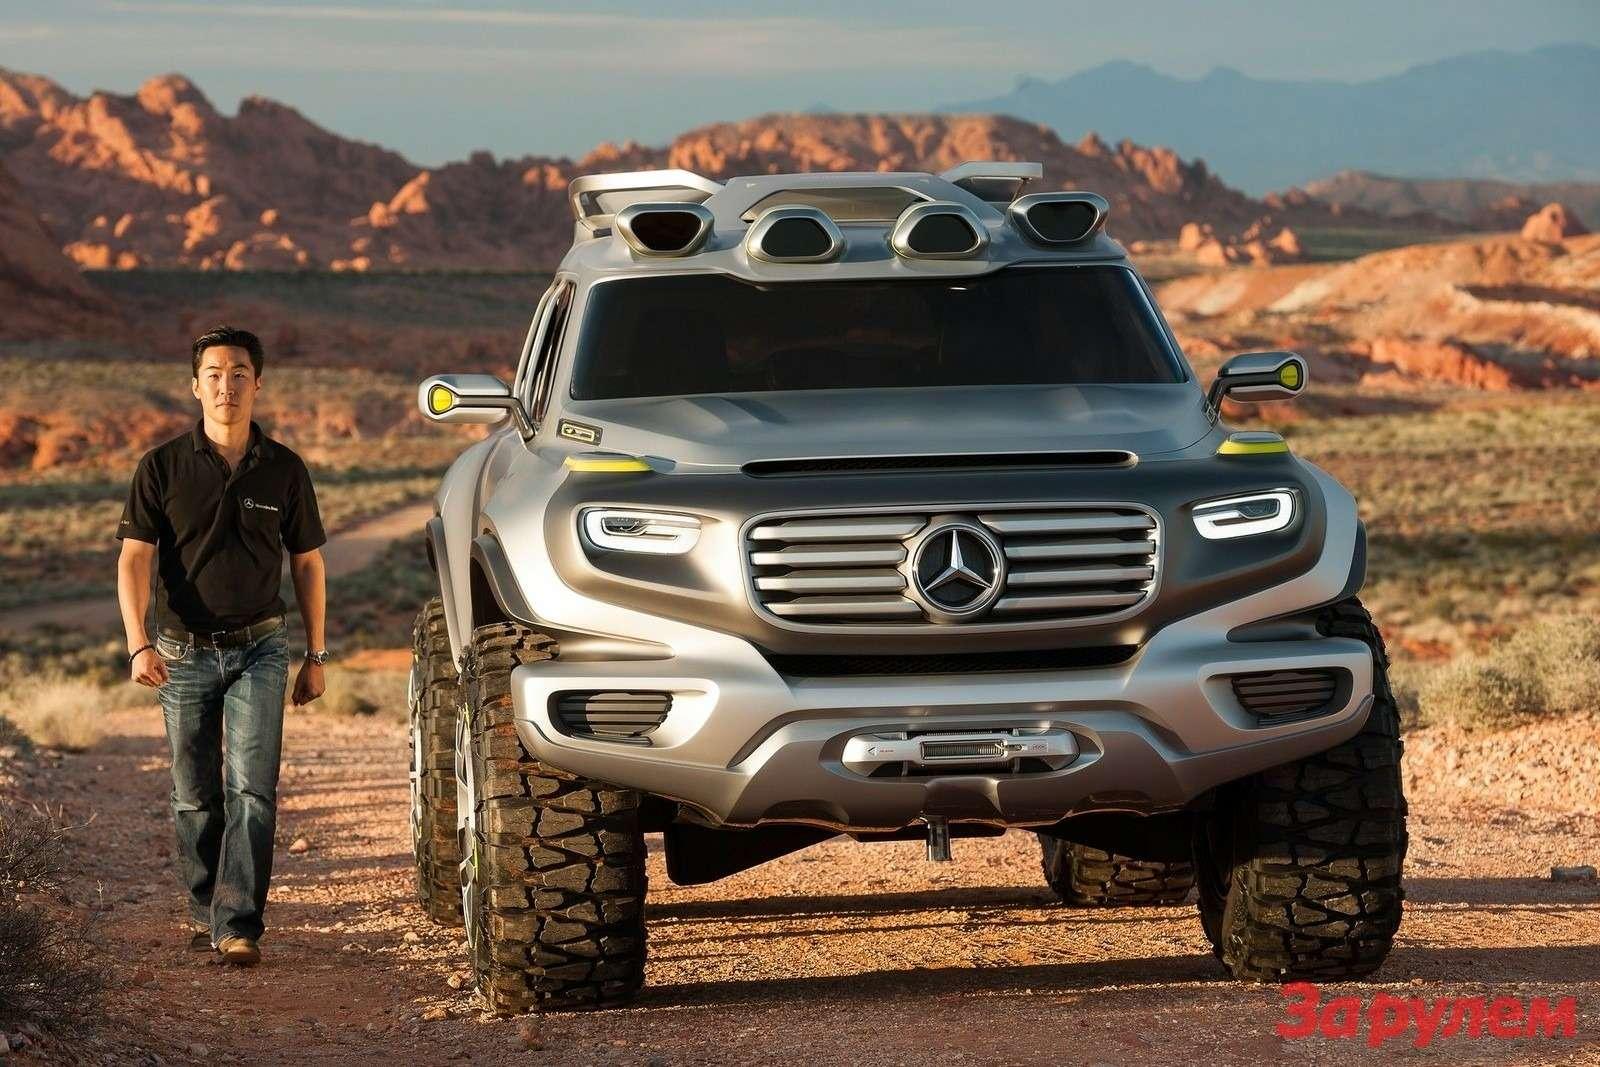 Mercedes-Benz Ener-G-Force Concept front view